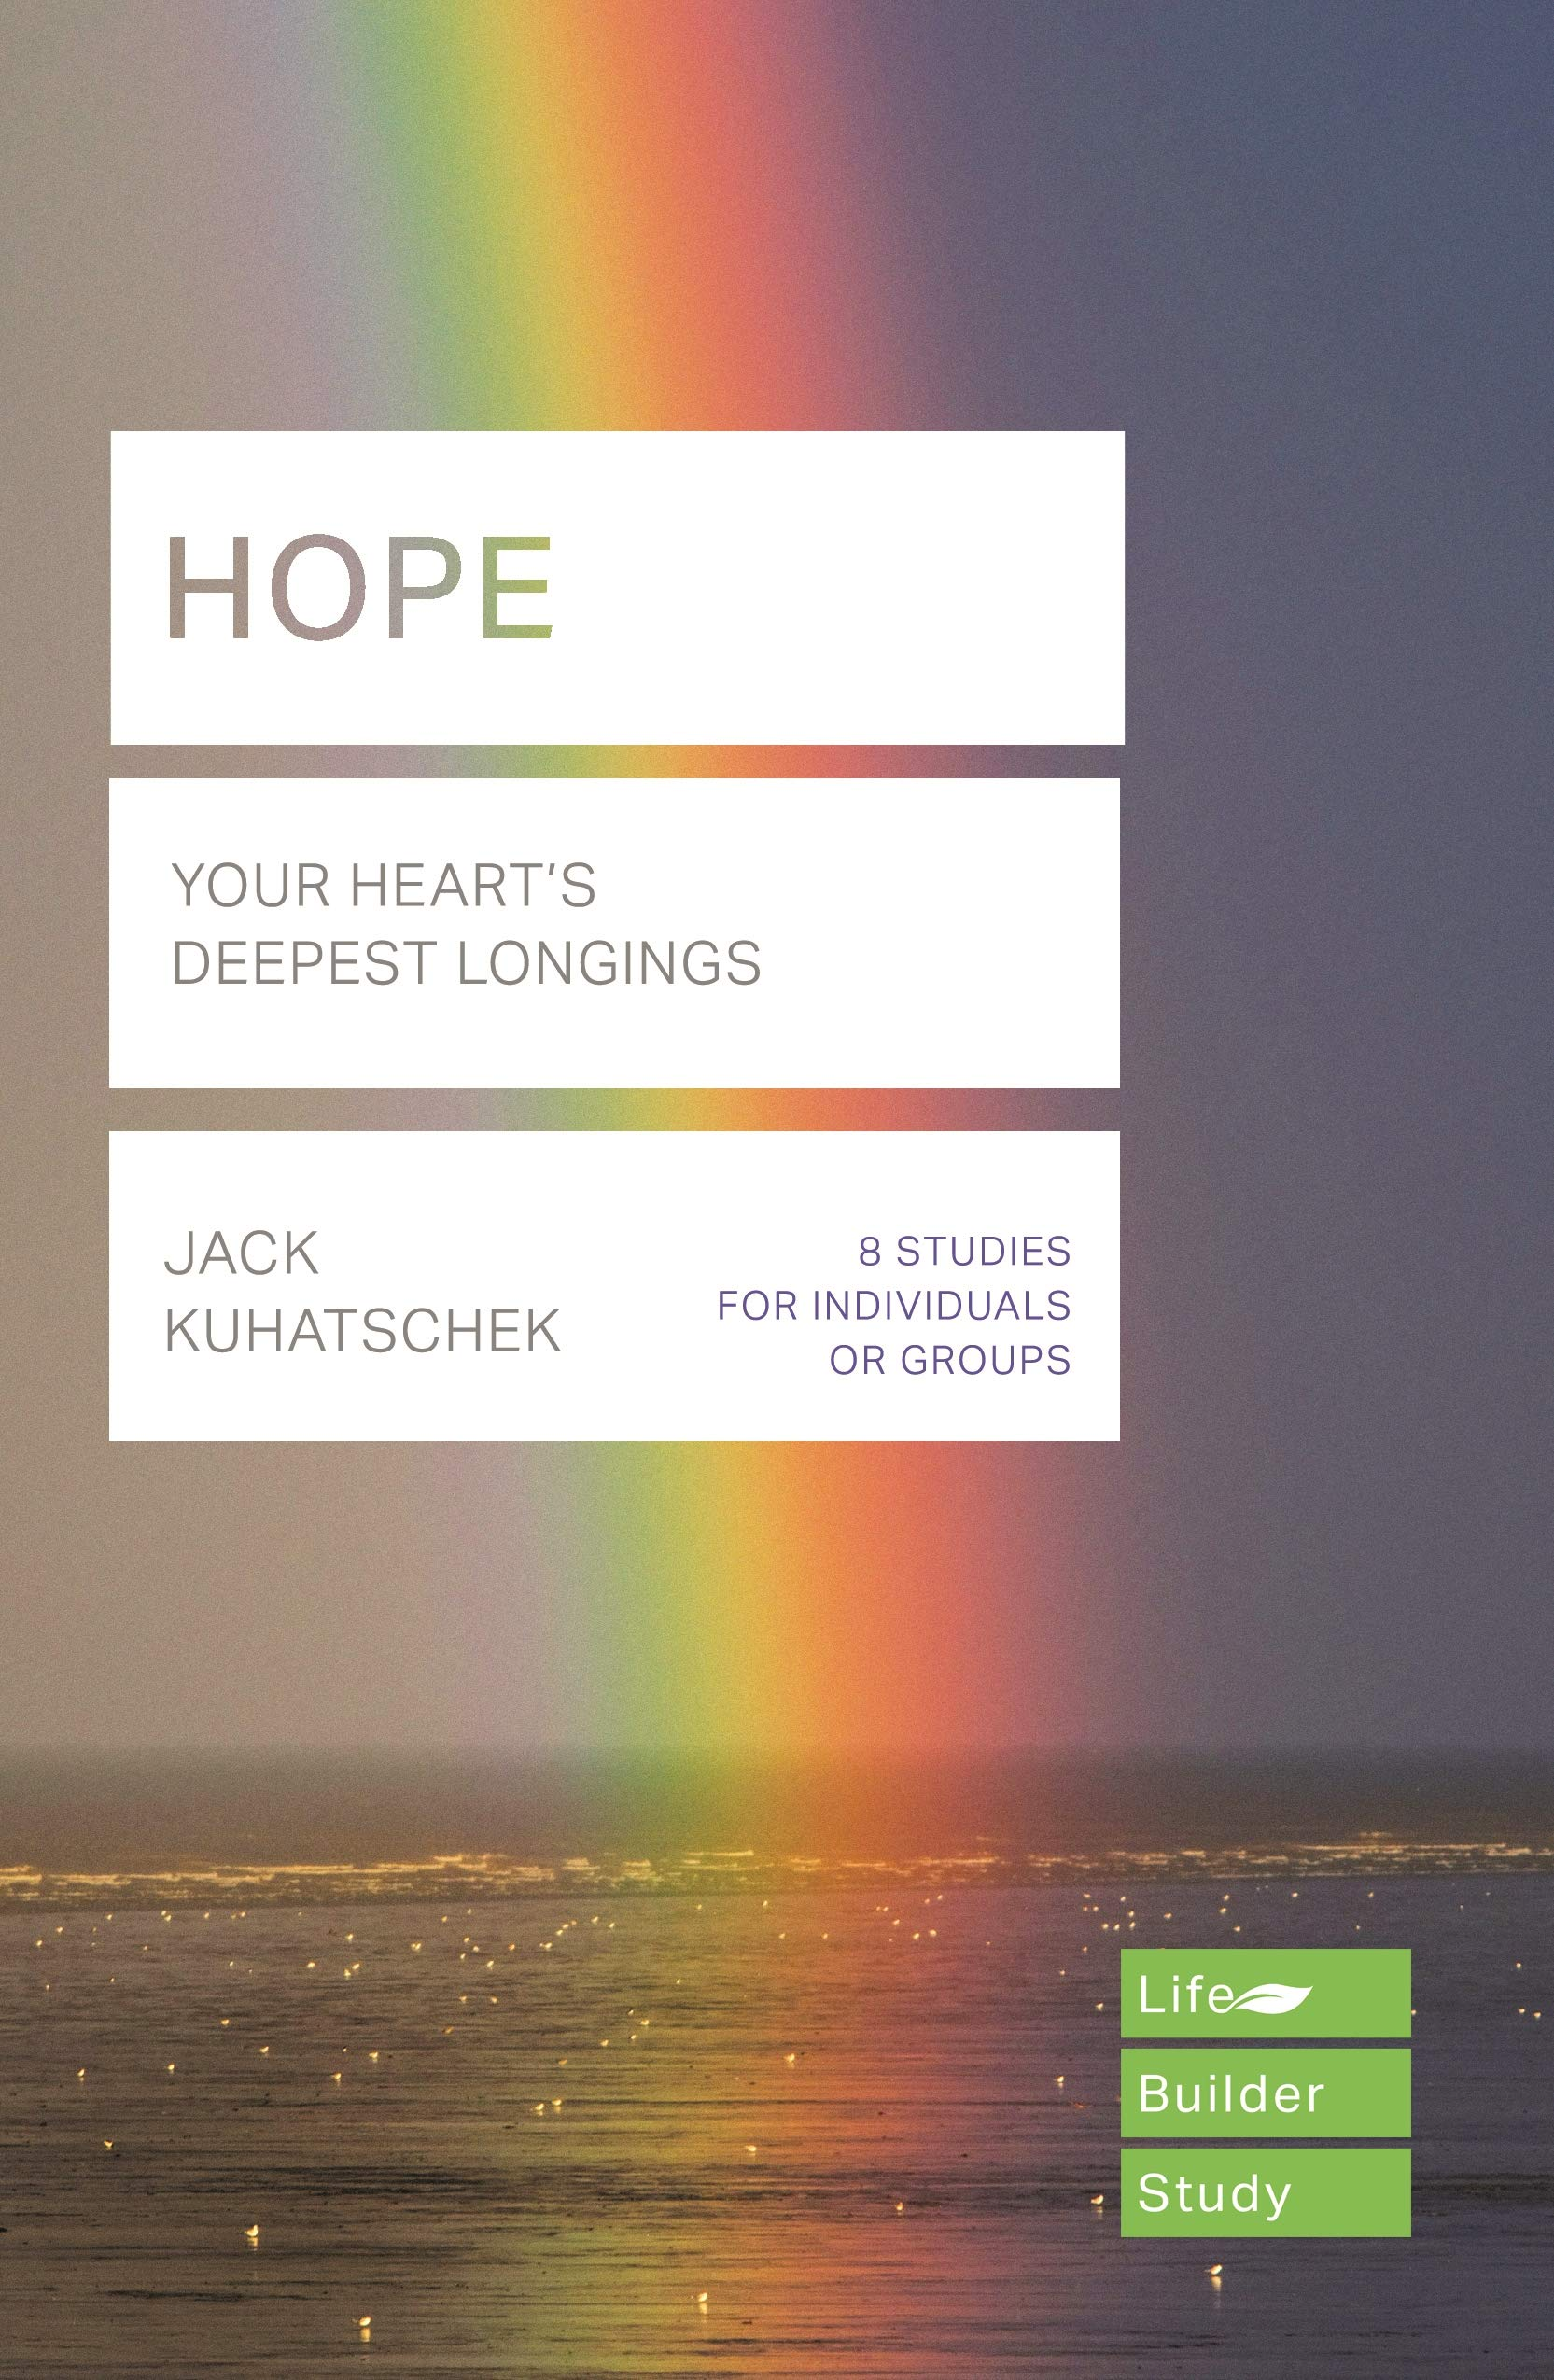 LifeBuilder: Hope